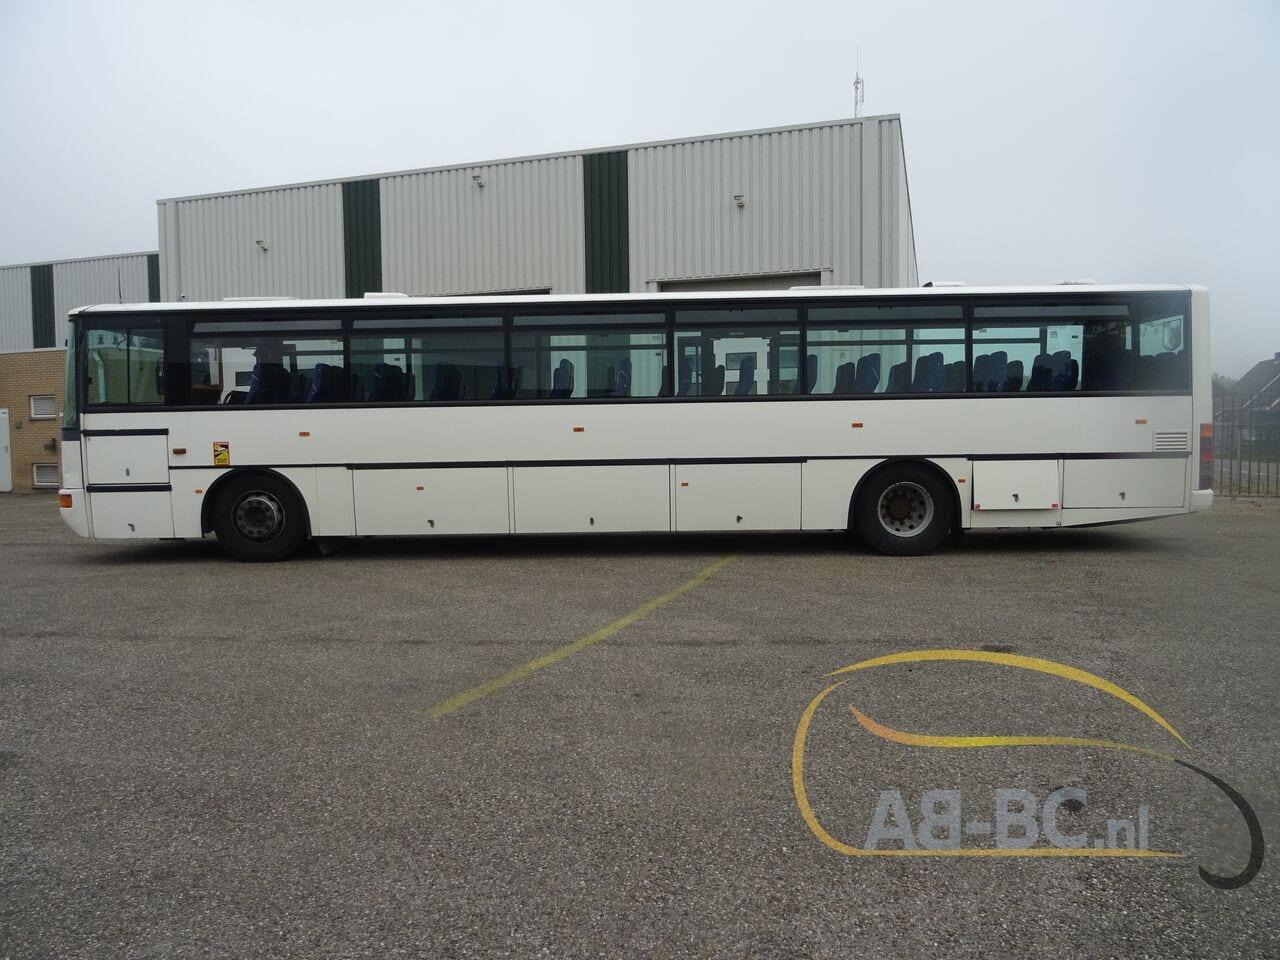 interurban-busIVECO-Irisbus-Recreo-64-Seats---1626159912667059094_big_60418b7d6338417984b4fc325c6acbed--21071309575983154500